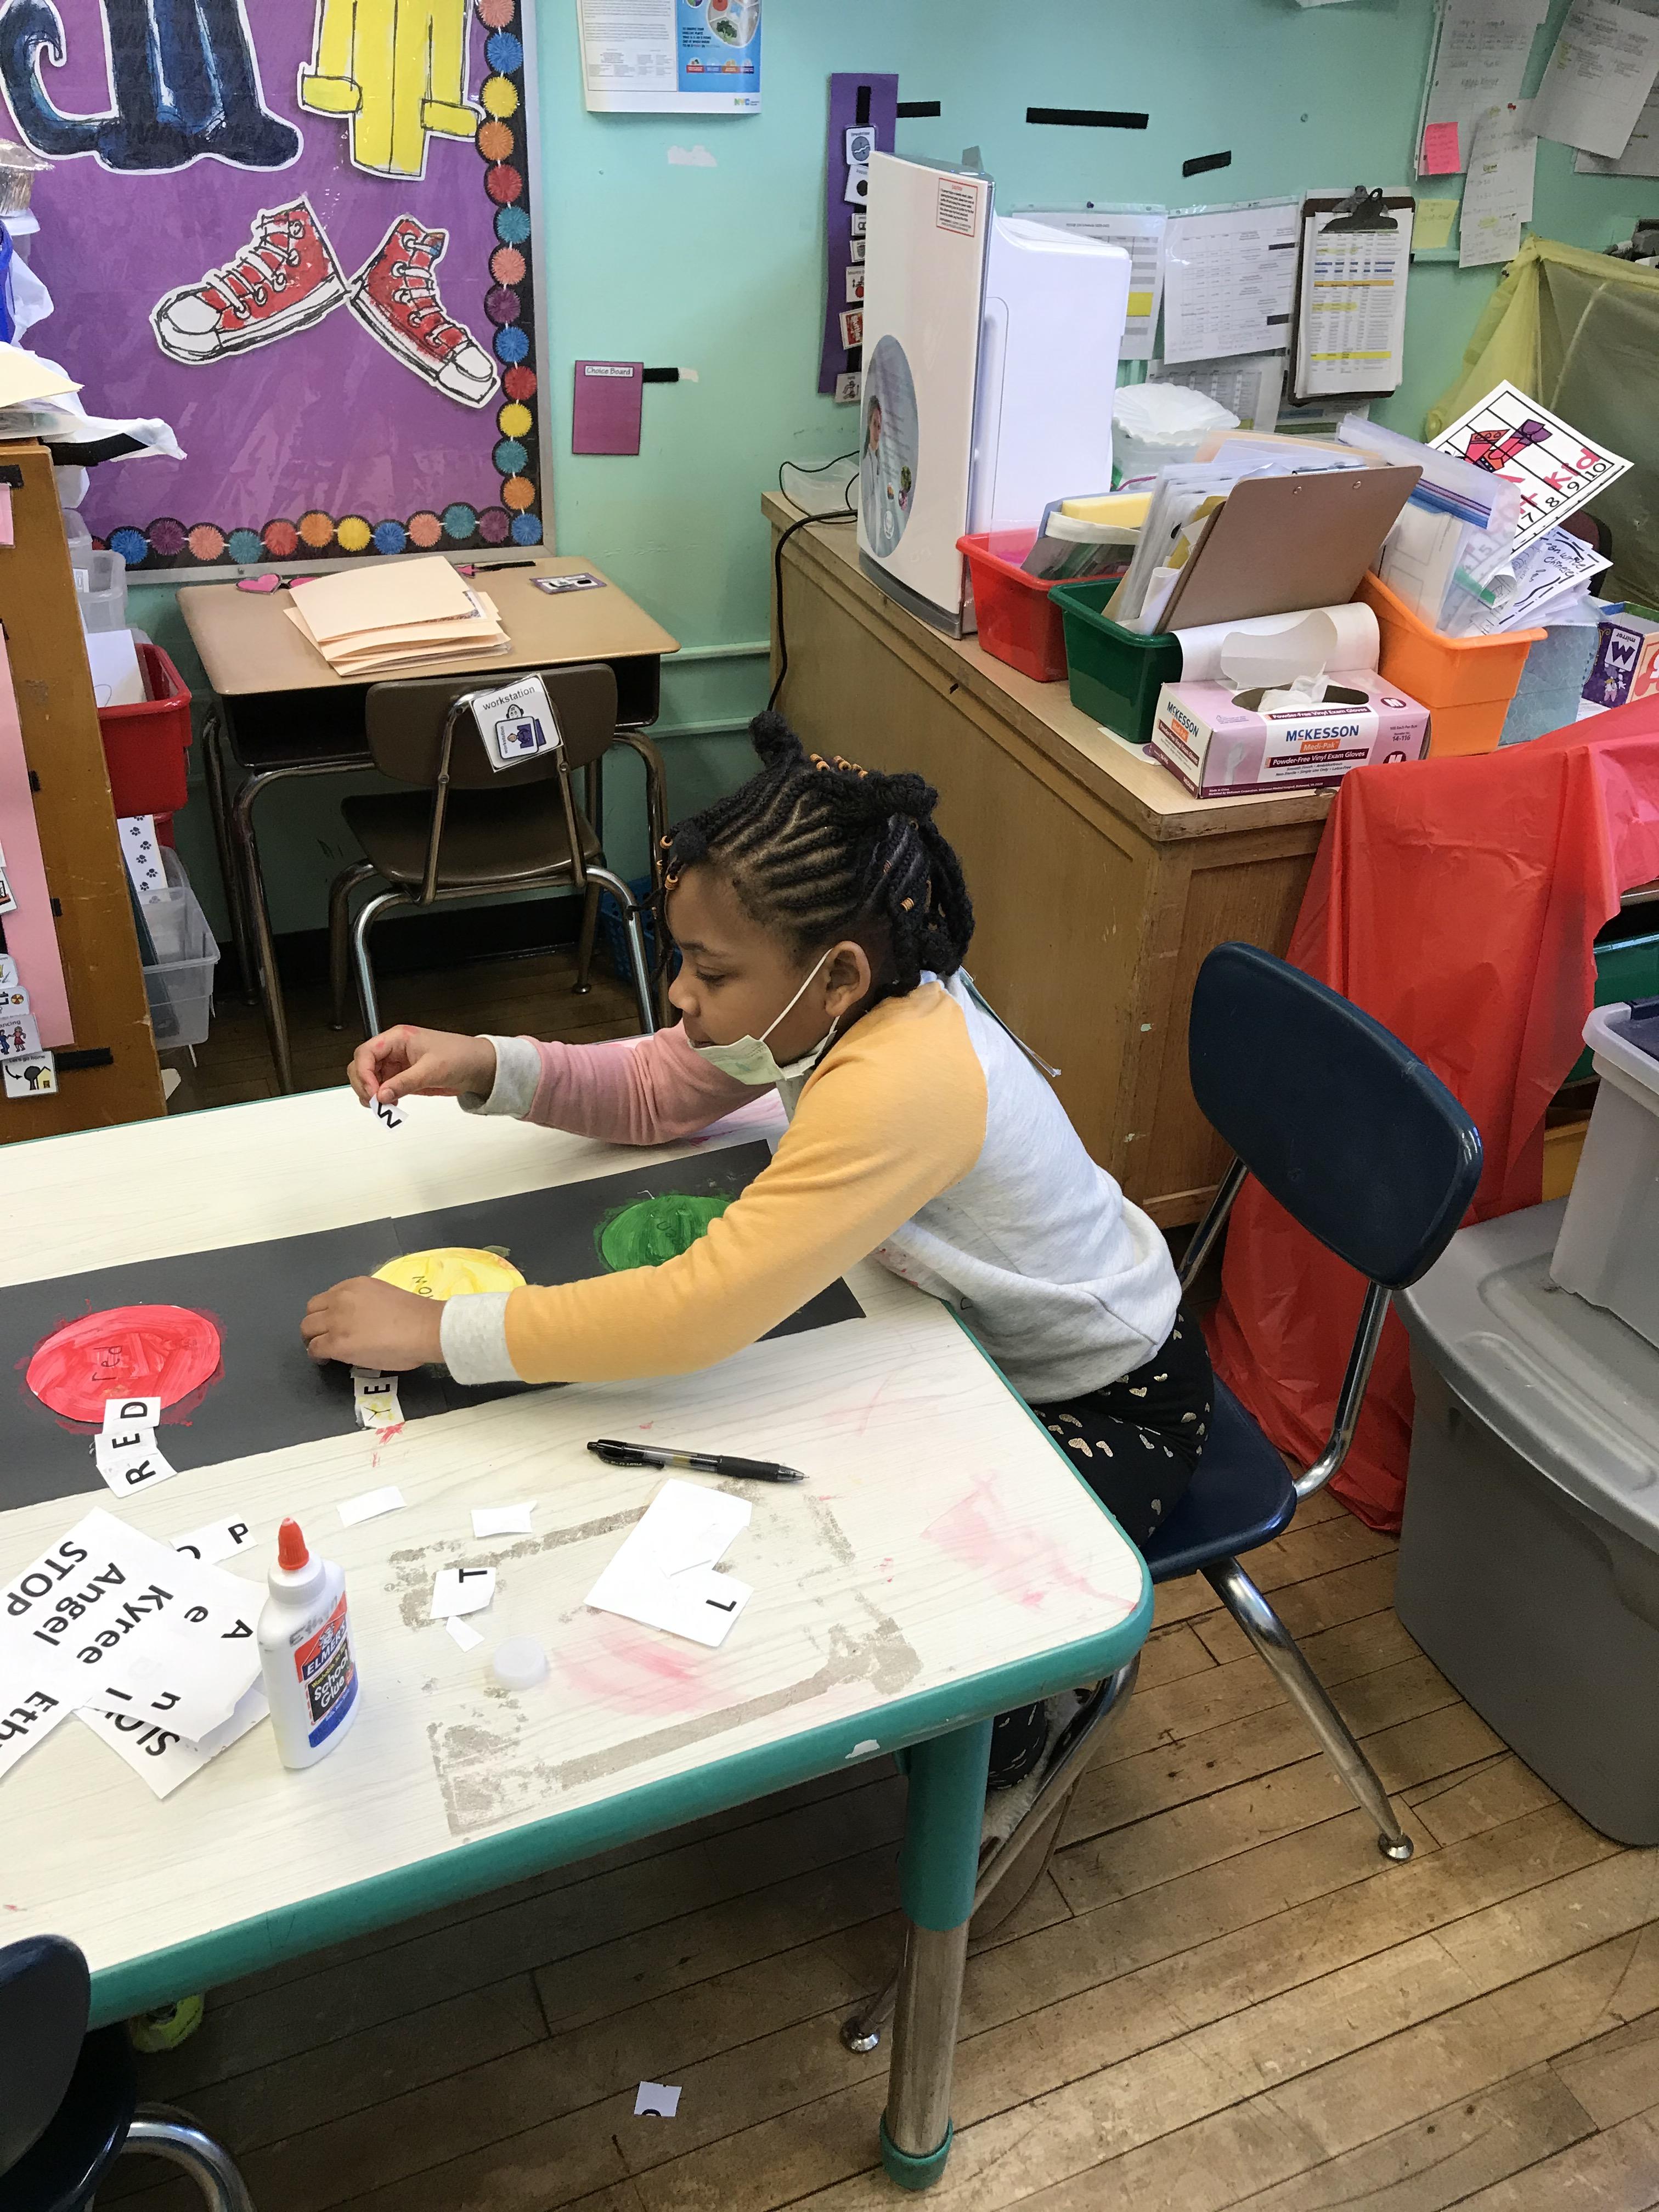 Child working on BLM activitiy